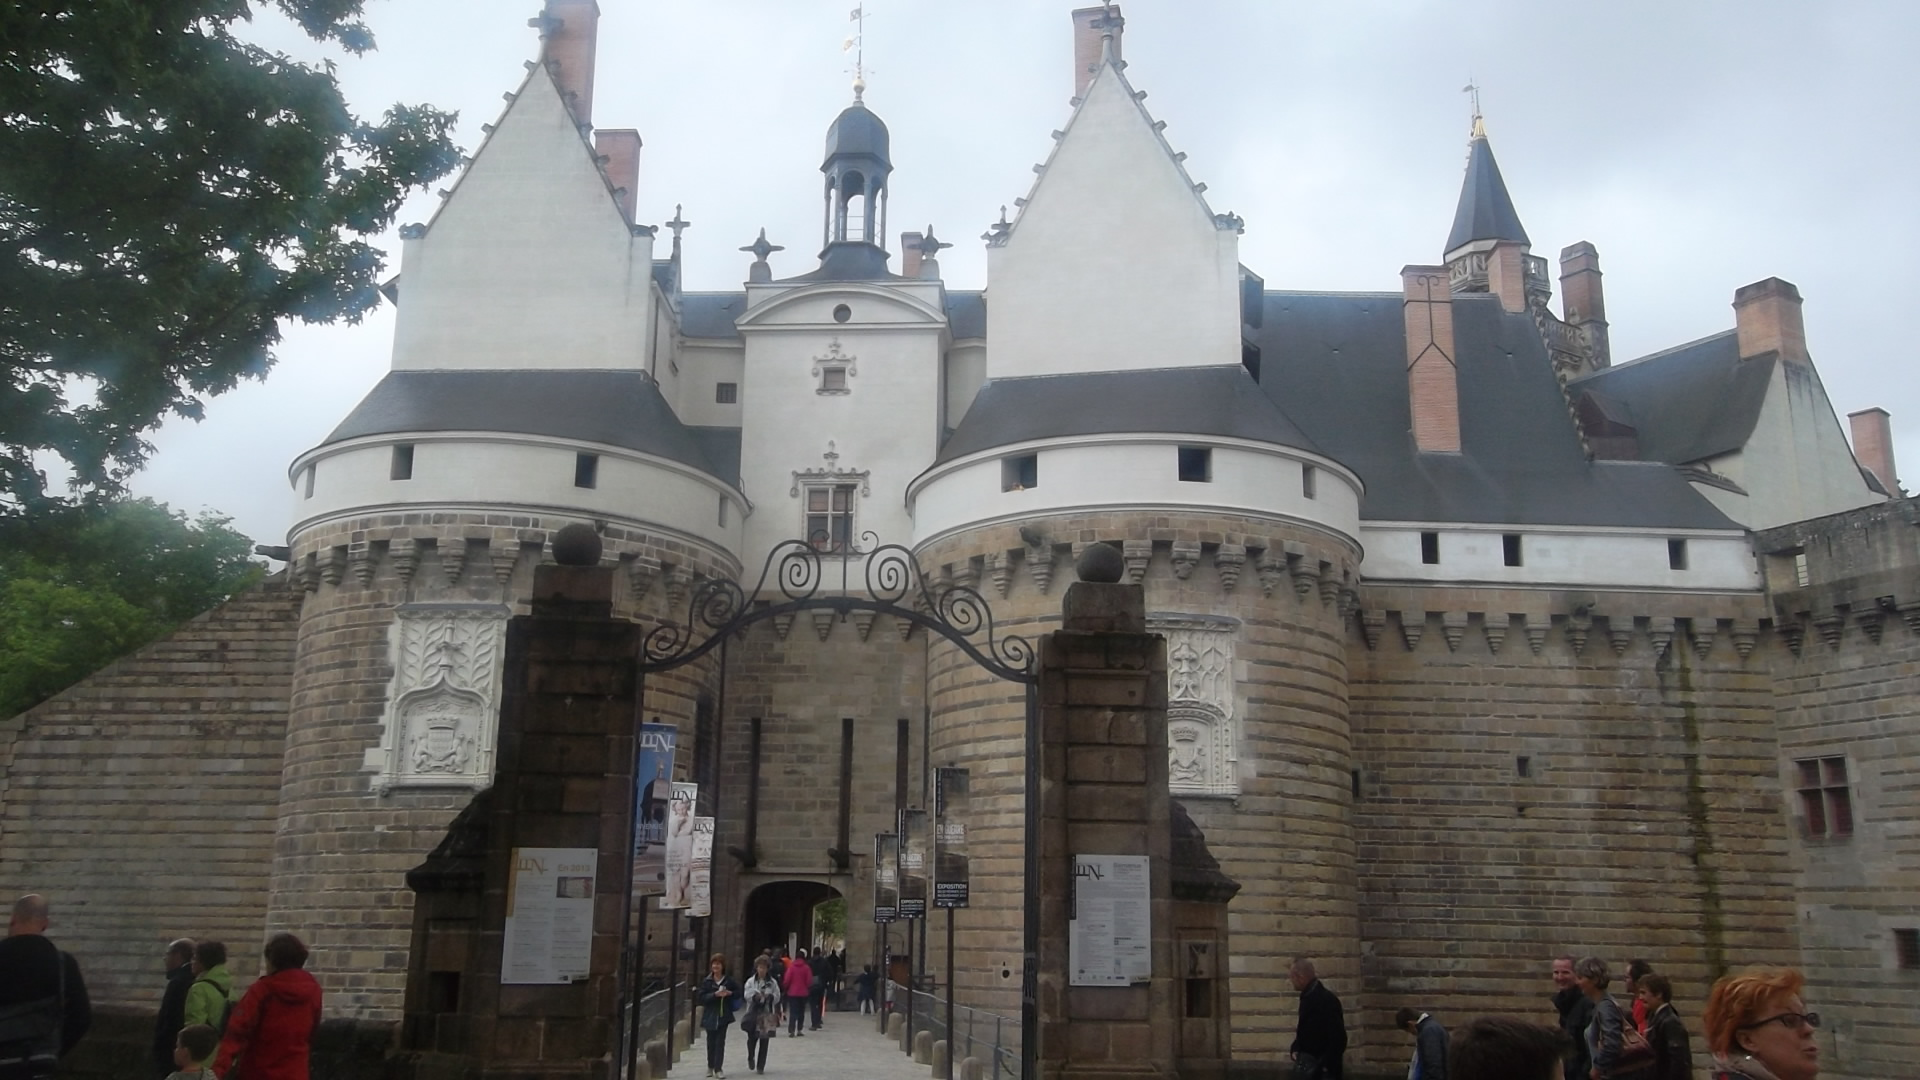 nantes-castle-dukes-main-ent-my13